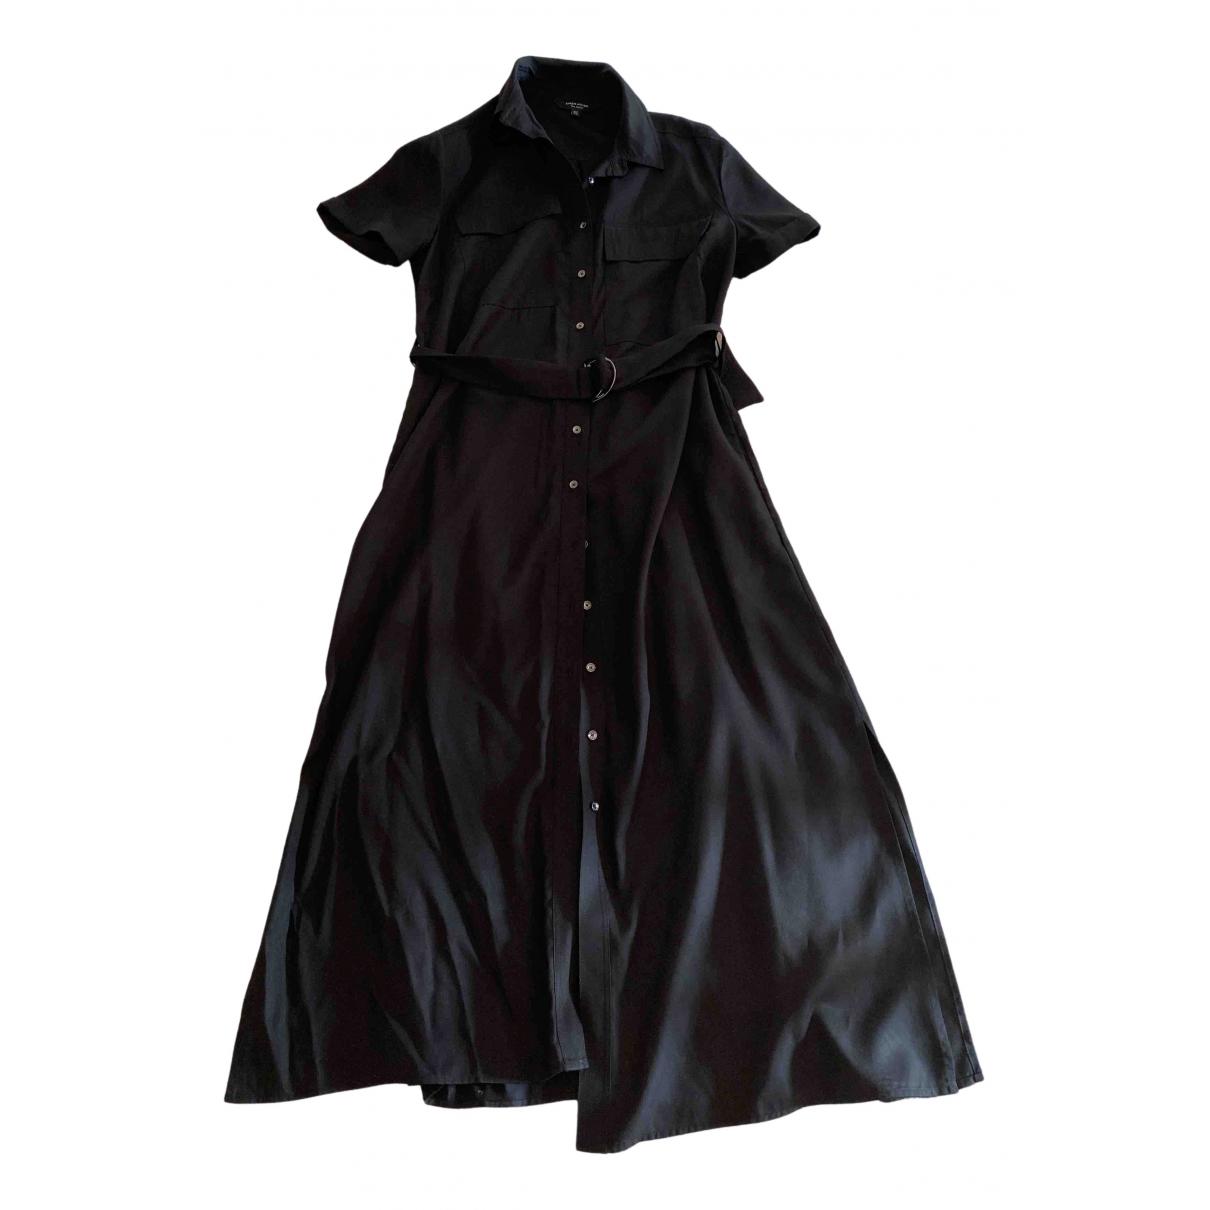 Karen Millen \N Black Cotton dress for Women 12 UK